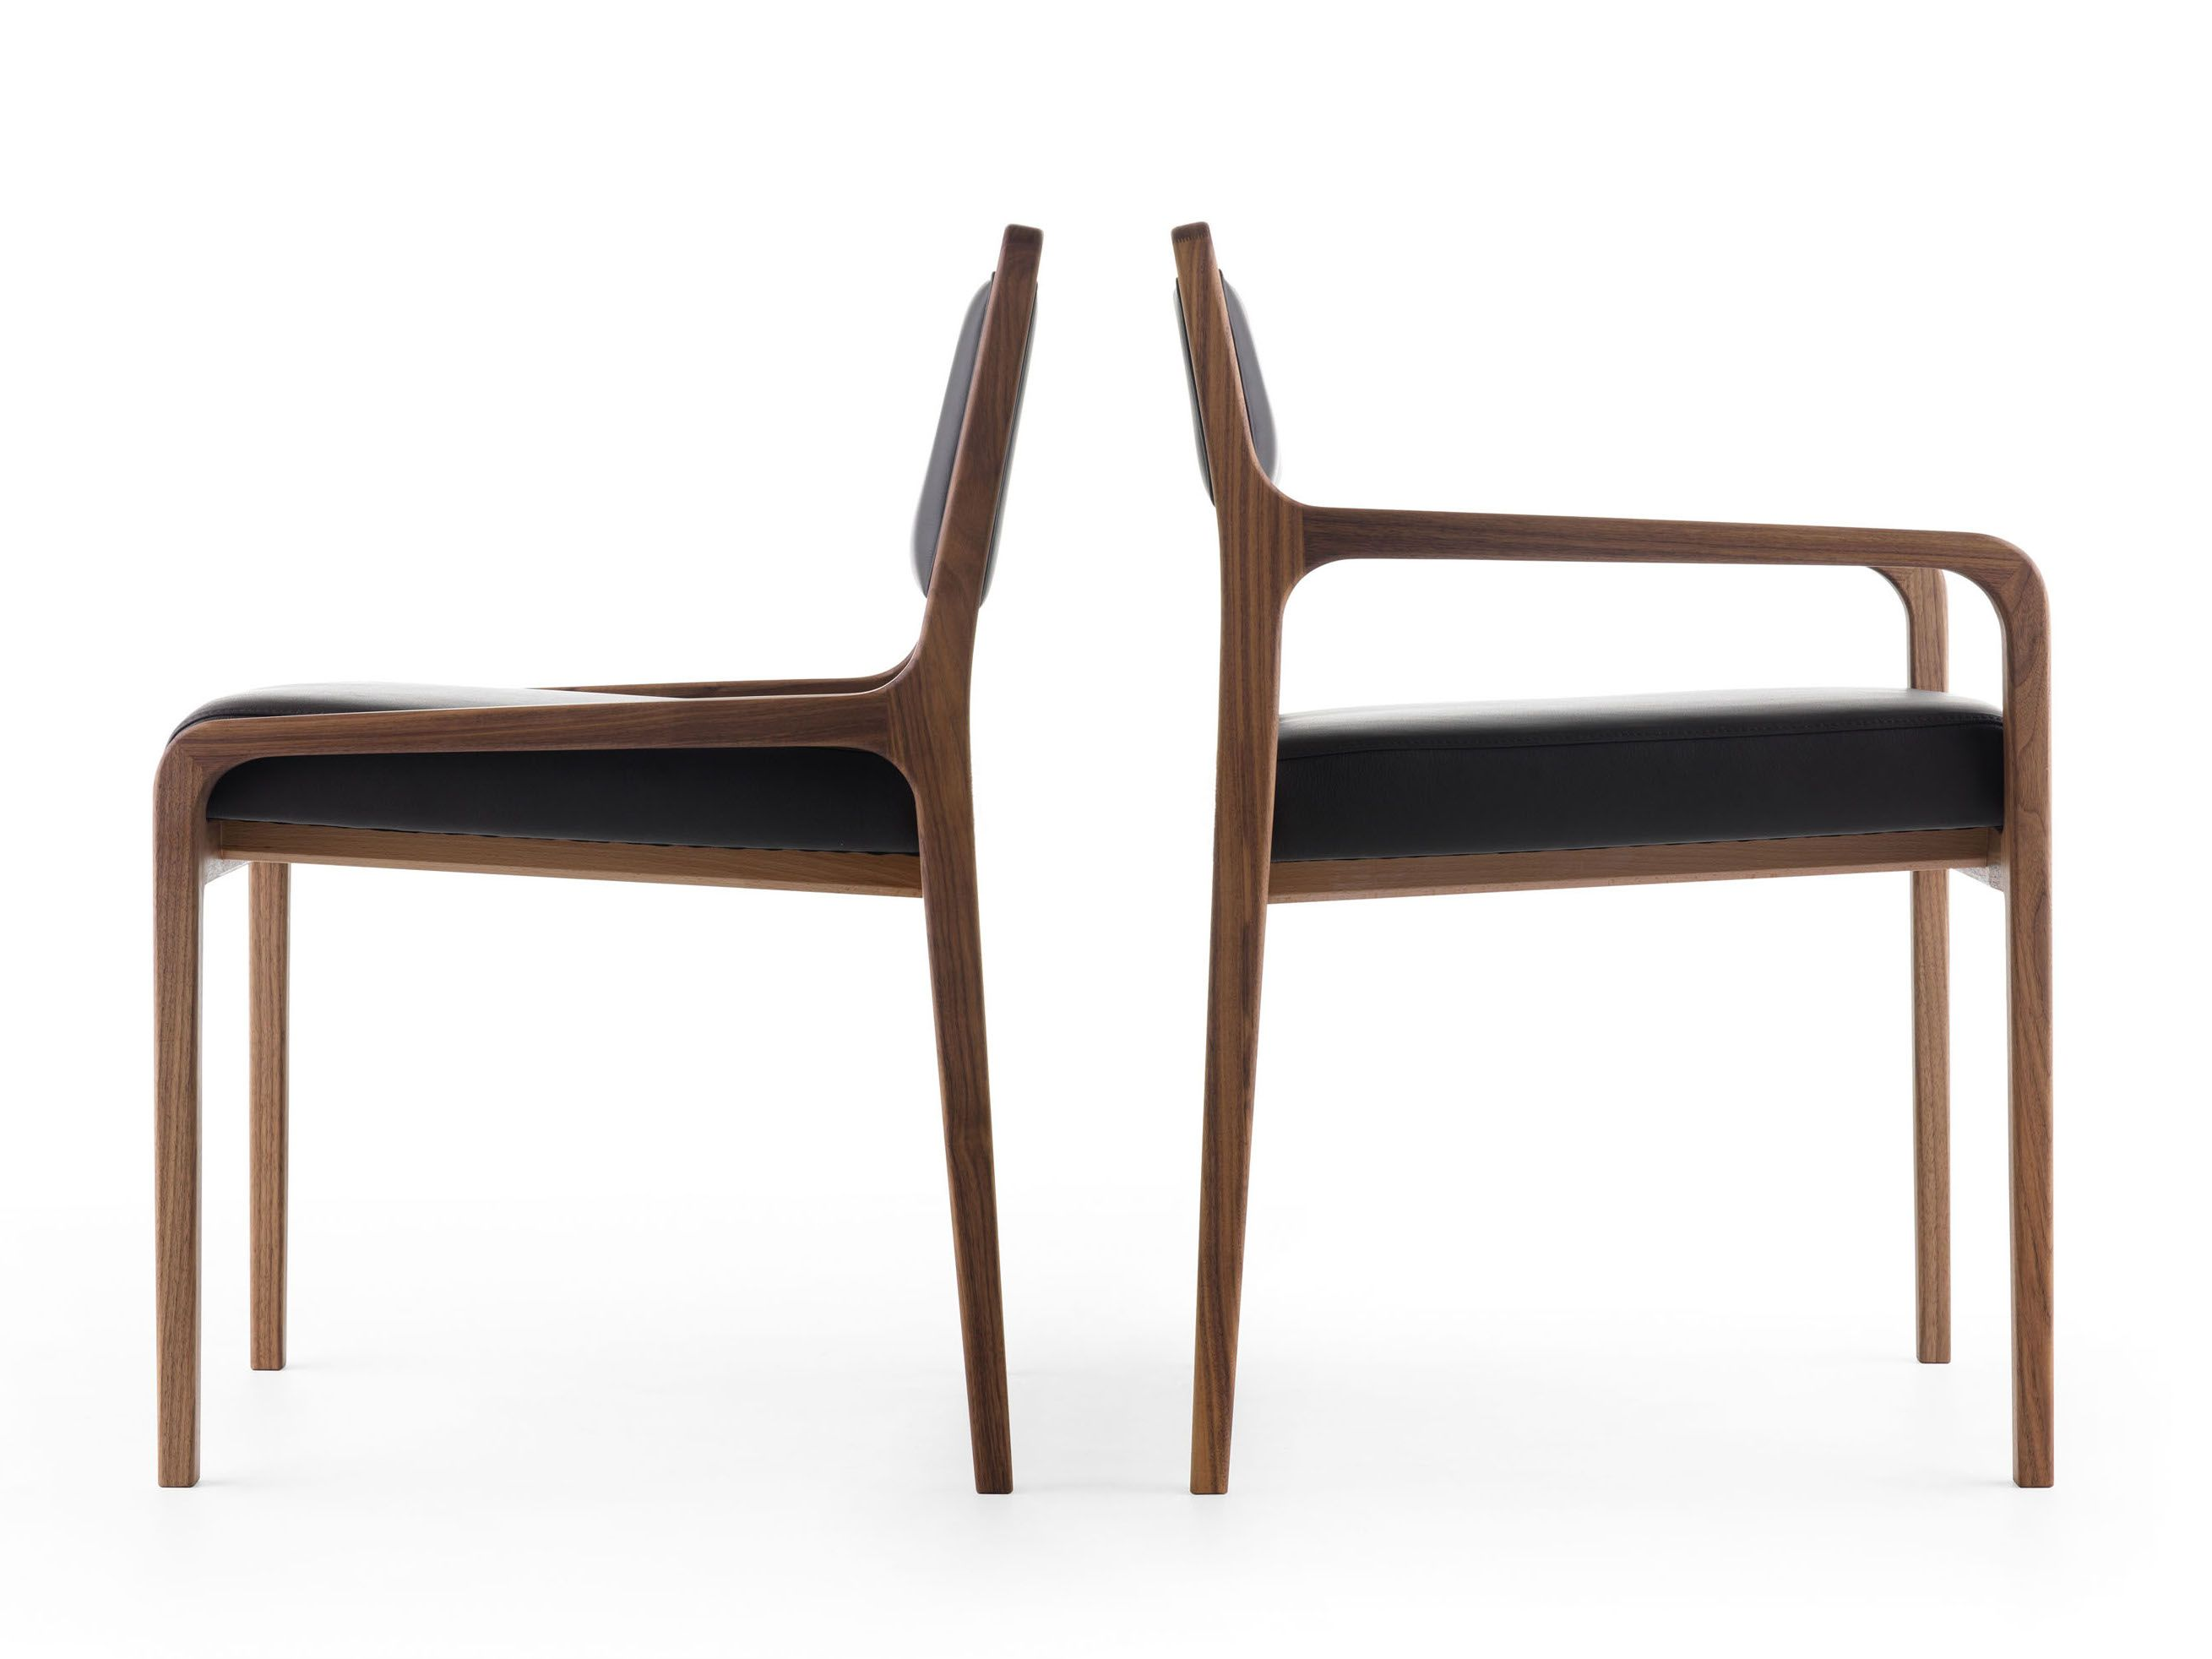 Cizeta Sedie ~ Fuji #stool from @cizetasedie #design by paolo martinig